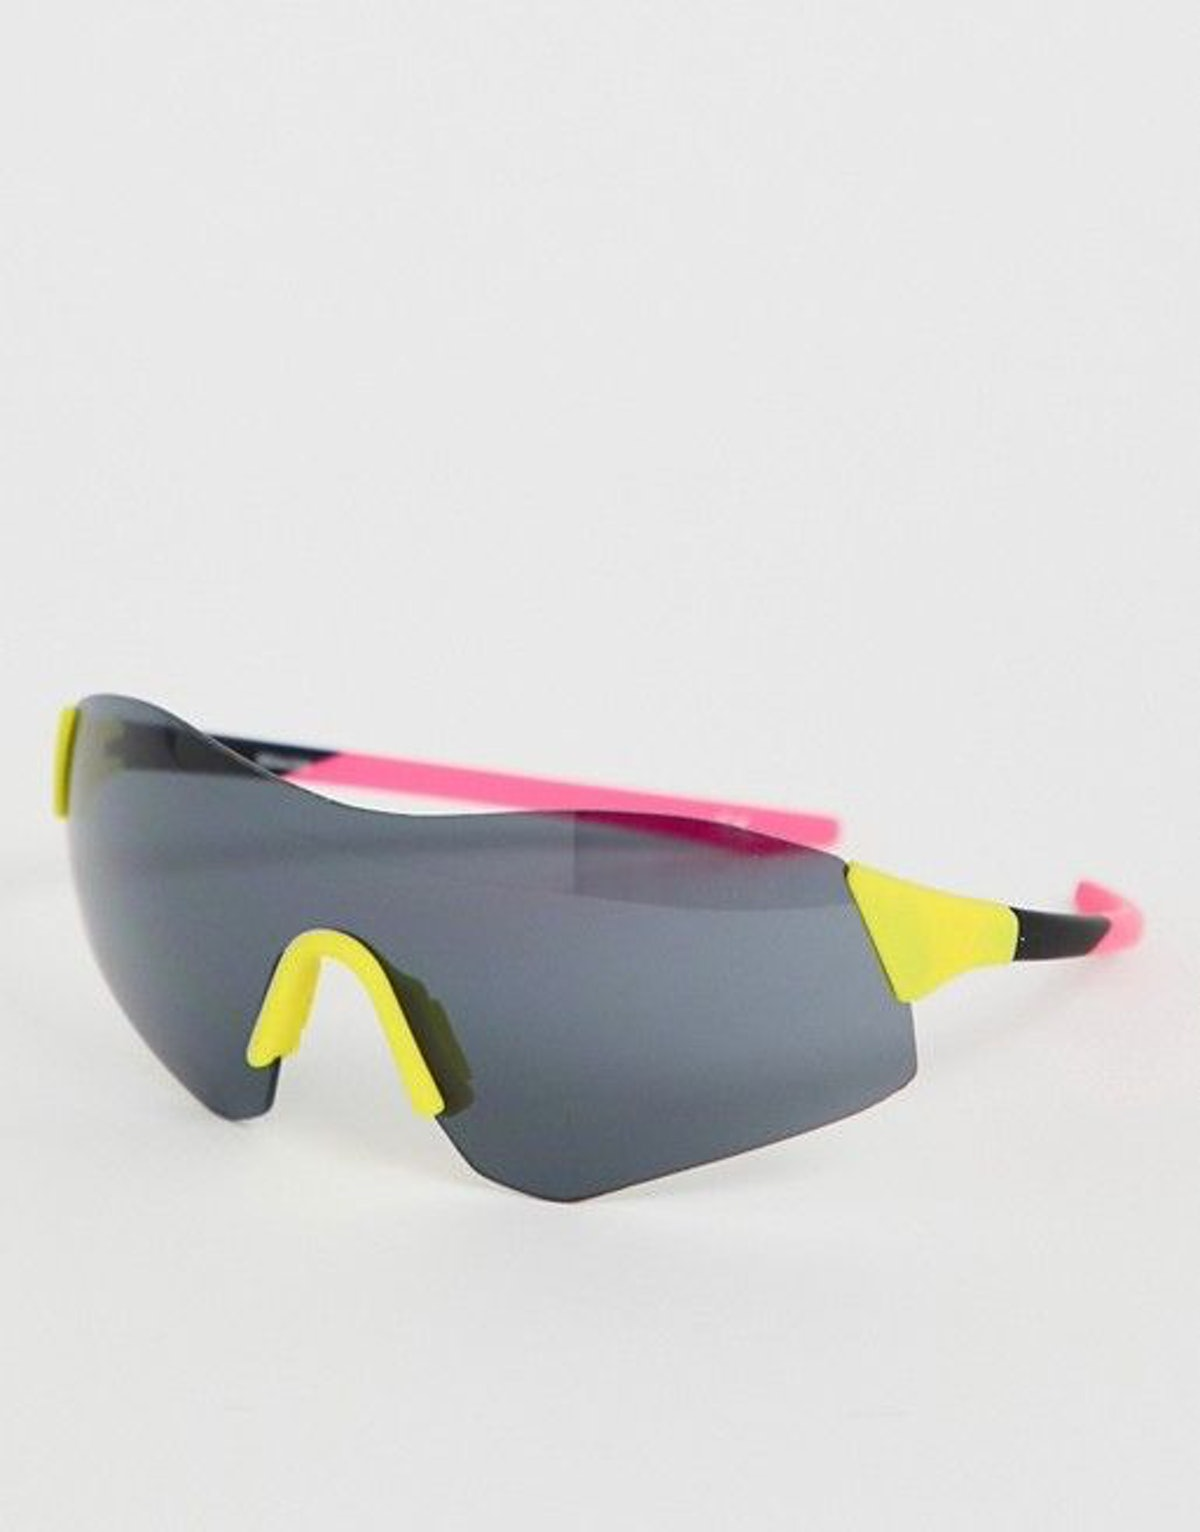 ASOS DESIGN Half Frame Color Block Visor Fashion Glasses in Neon